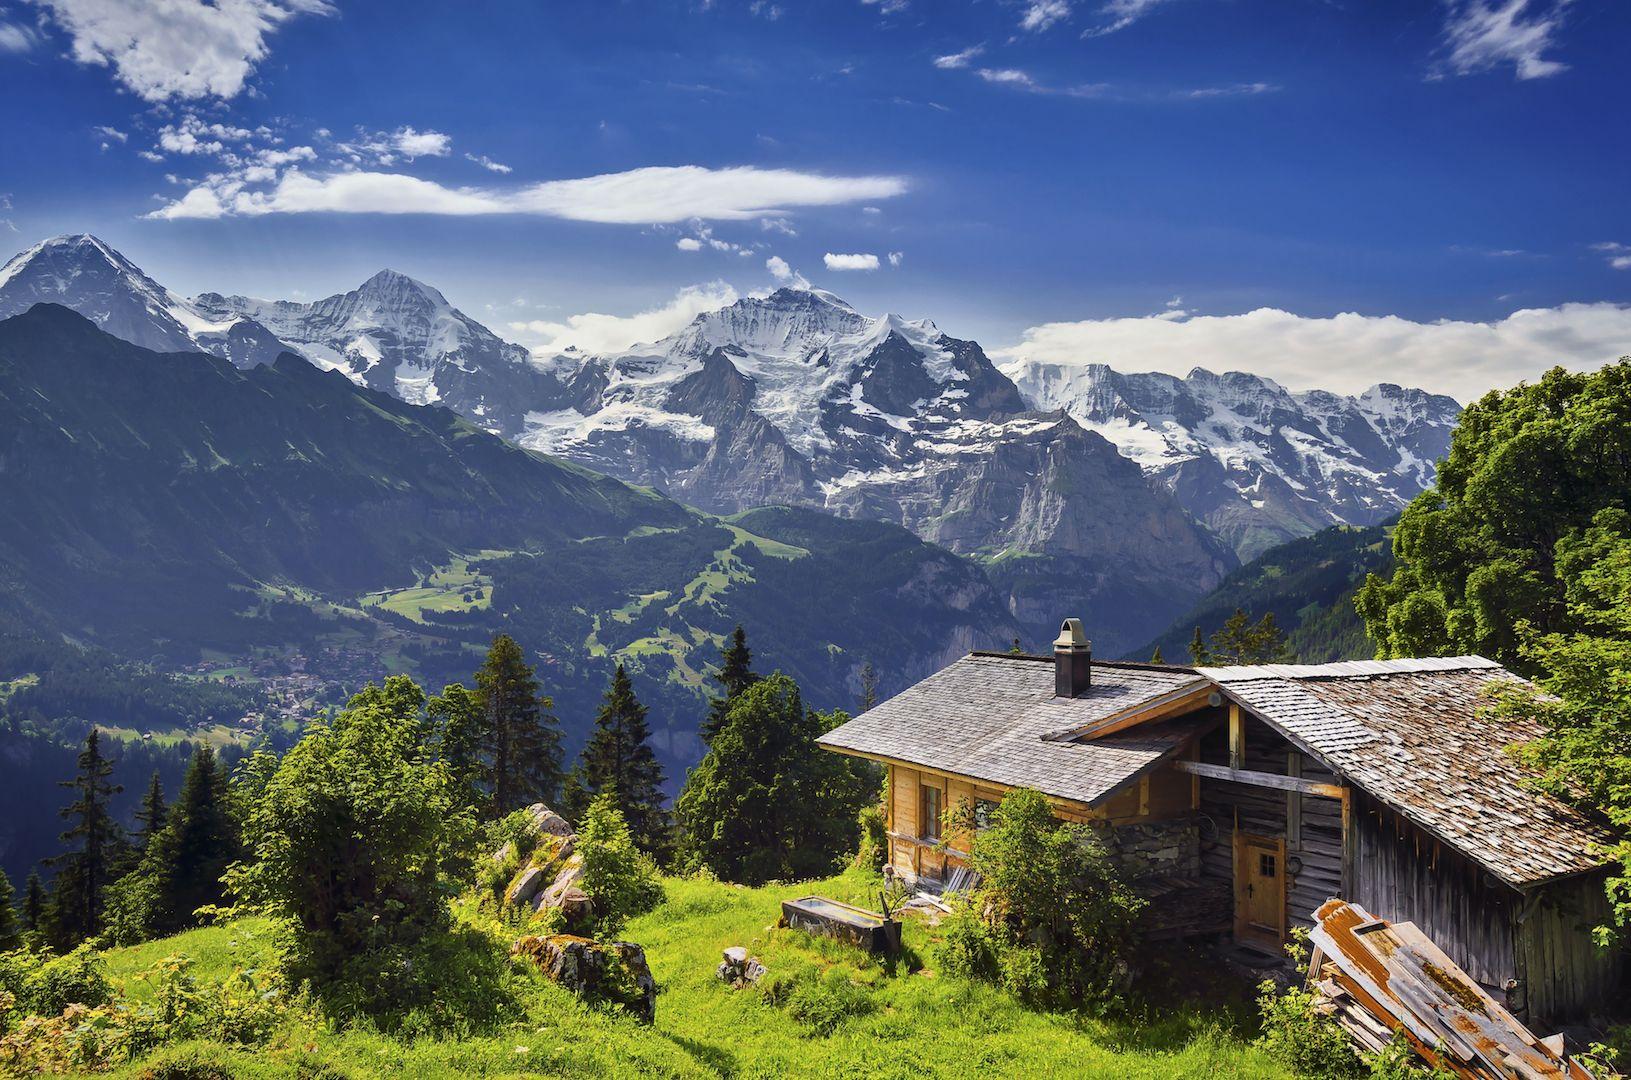 Circuit organis italie suisse s jour sur mesure lc - Alpen dekoration ...